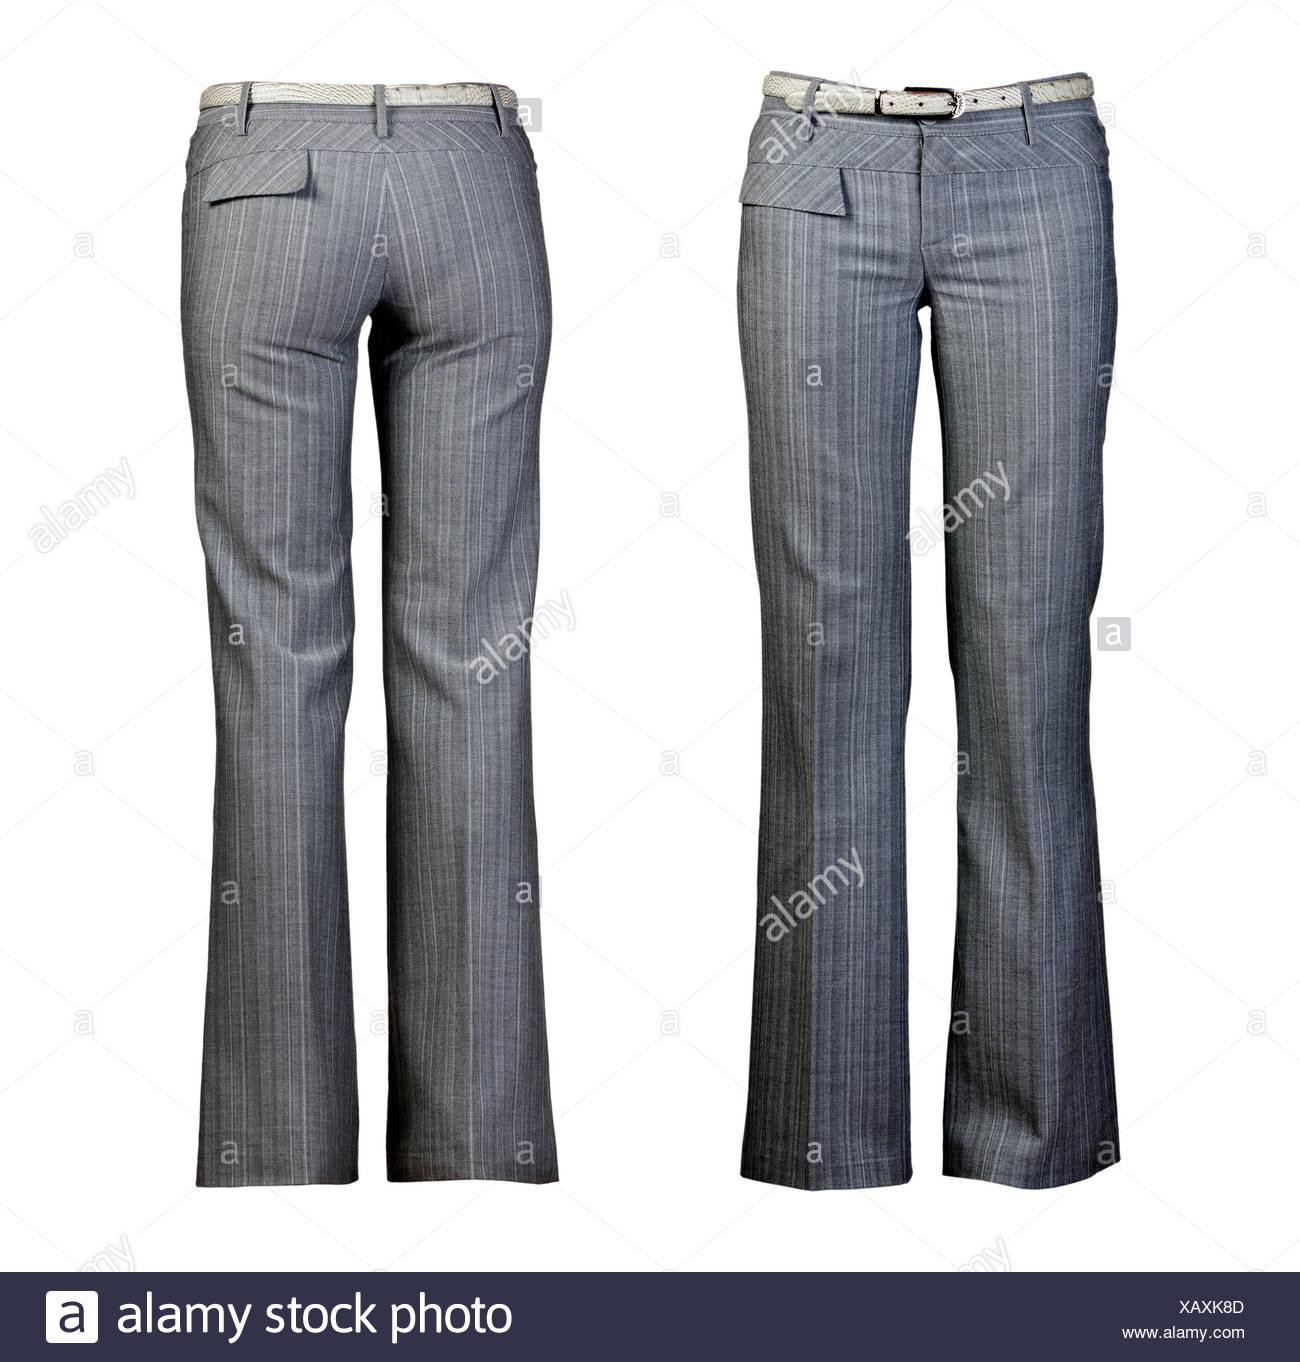 Mujer Mujer Aislado Moda Mujer Moderno Modernidad Elegancia Pantalones Fotografia De Stock Alamy